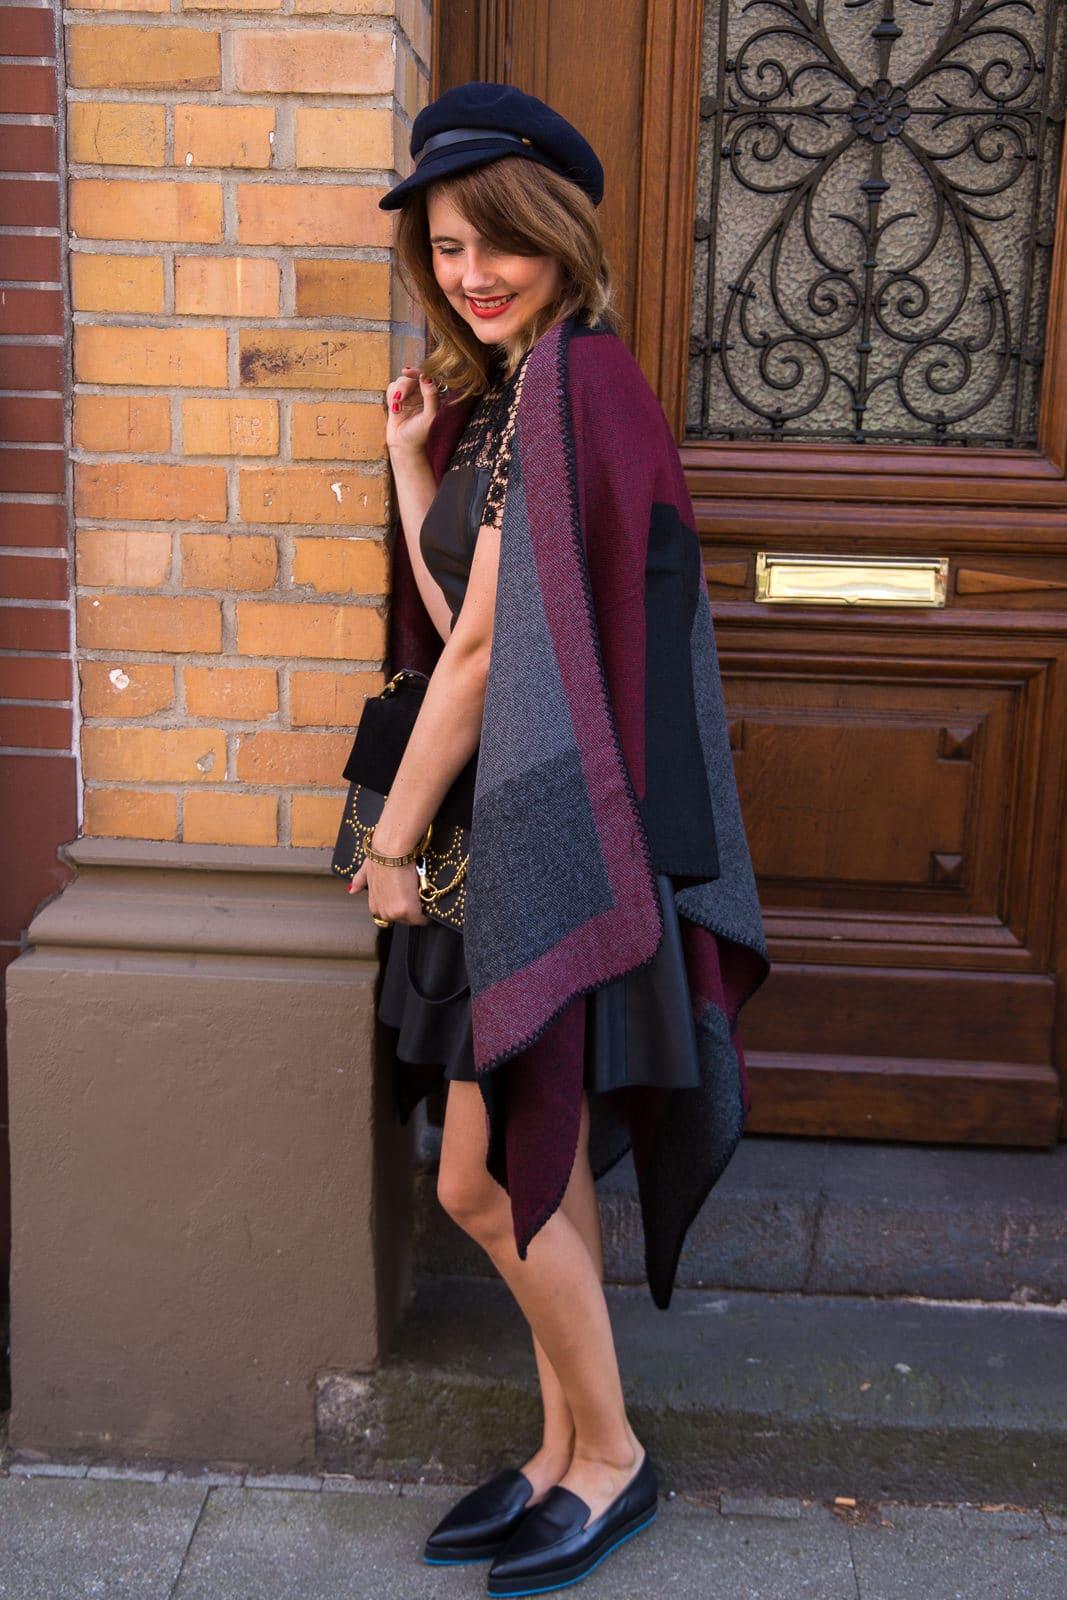 outfit-lederkleid-herbstliches-cape-loafers-chloe-faye-bag-fashion-blog-des-belles-choses-3